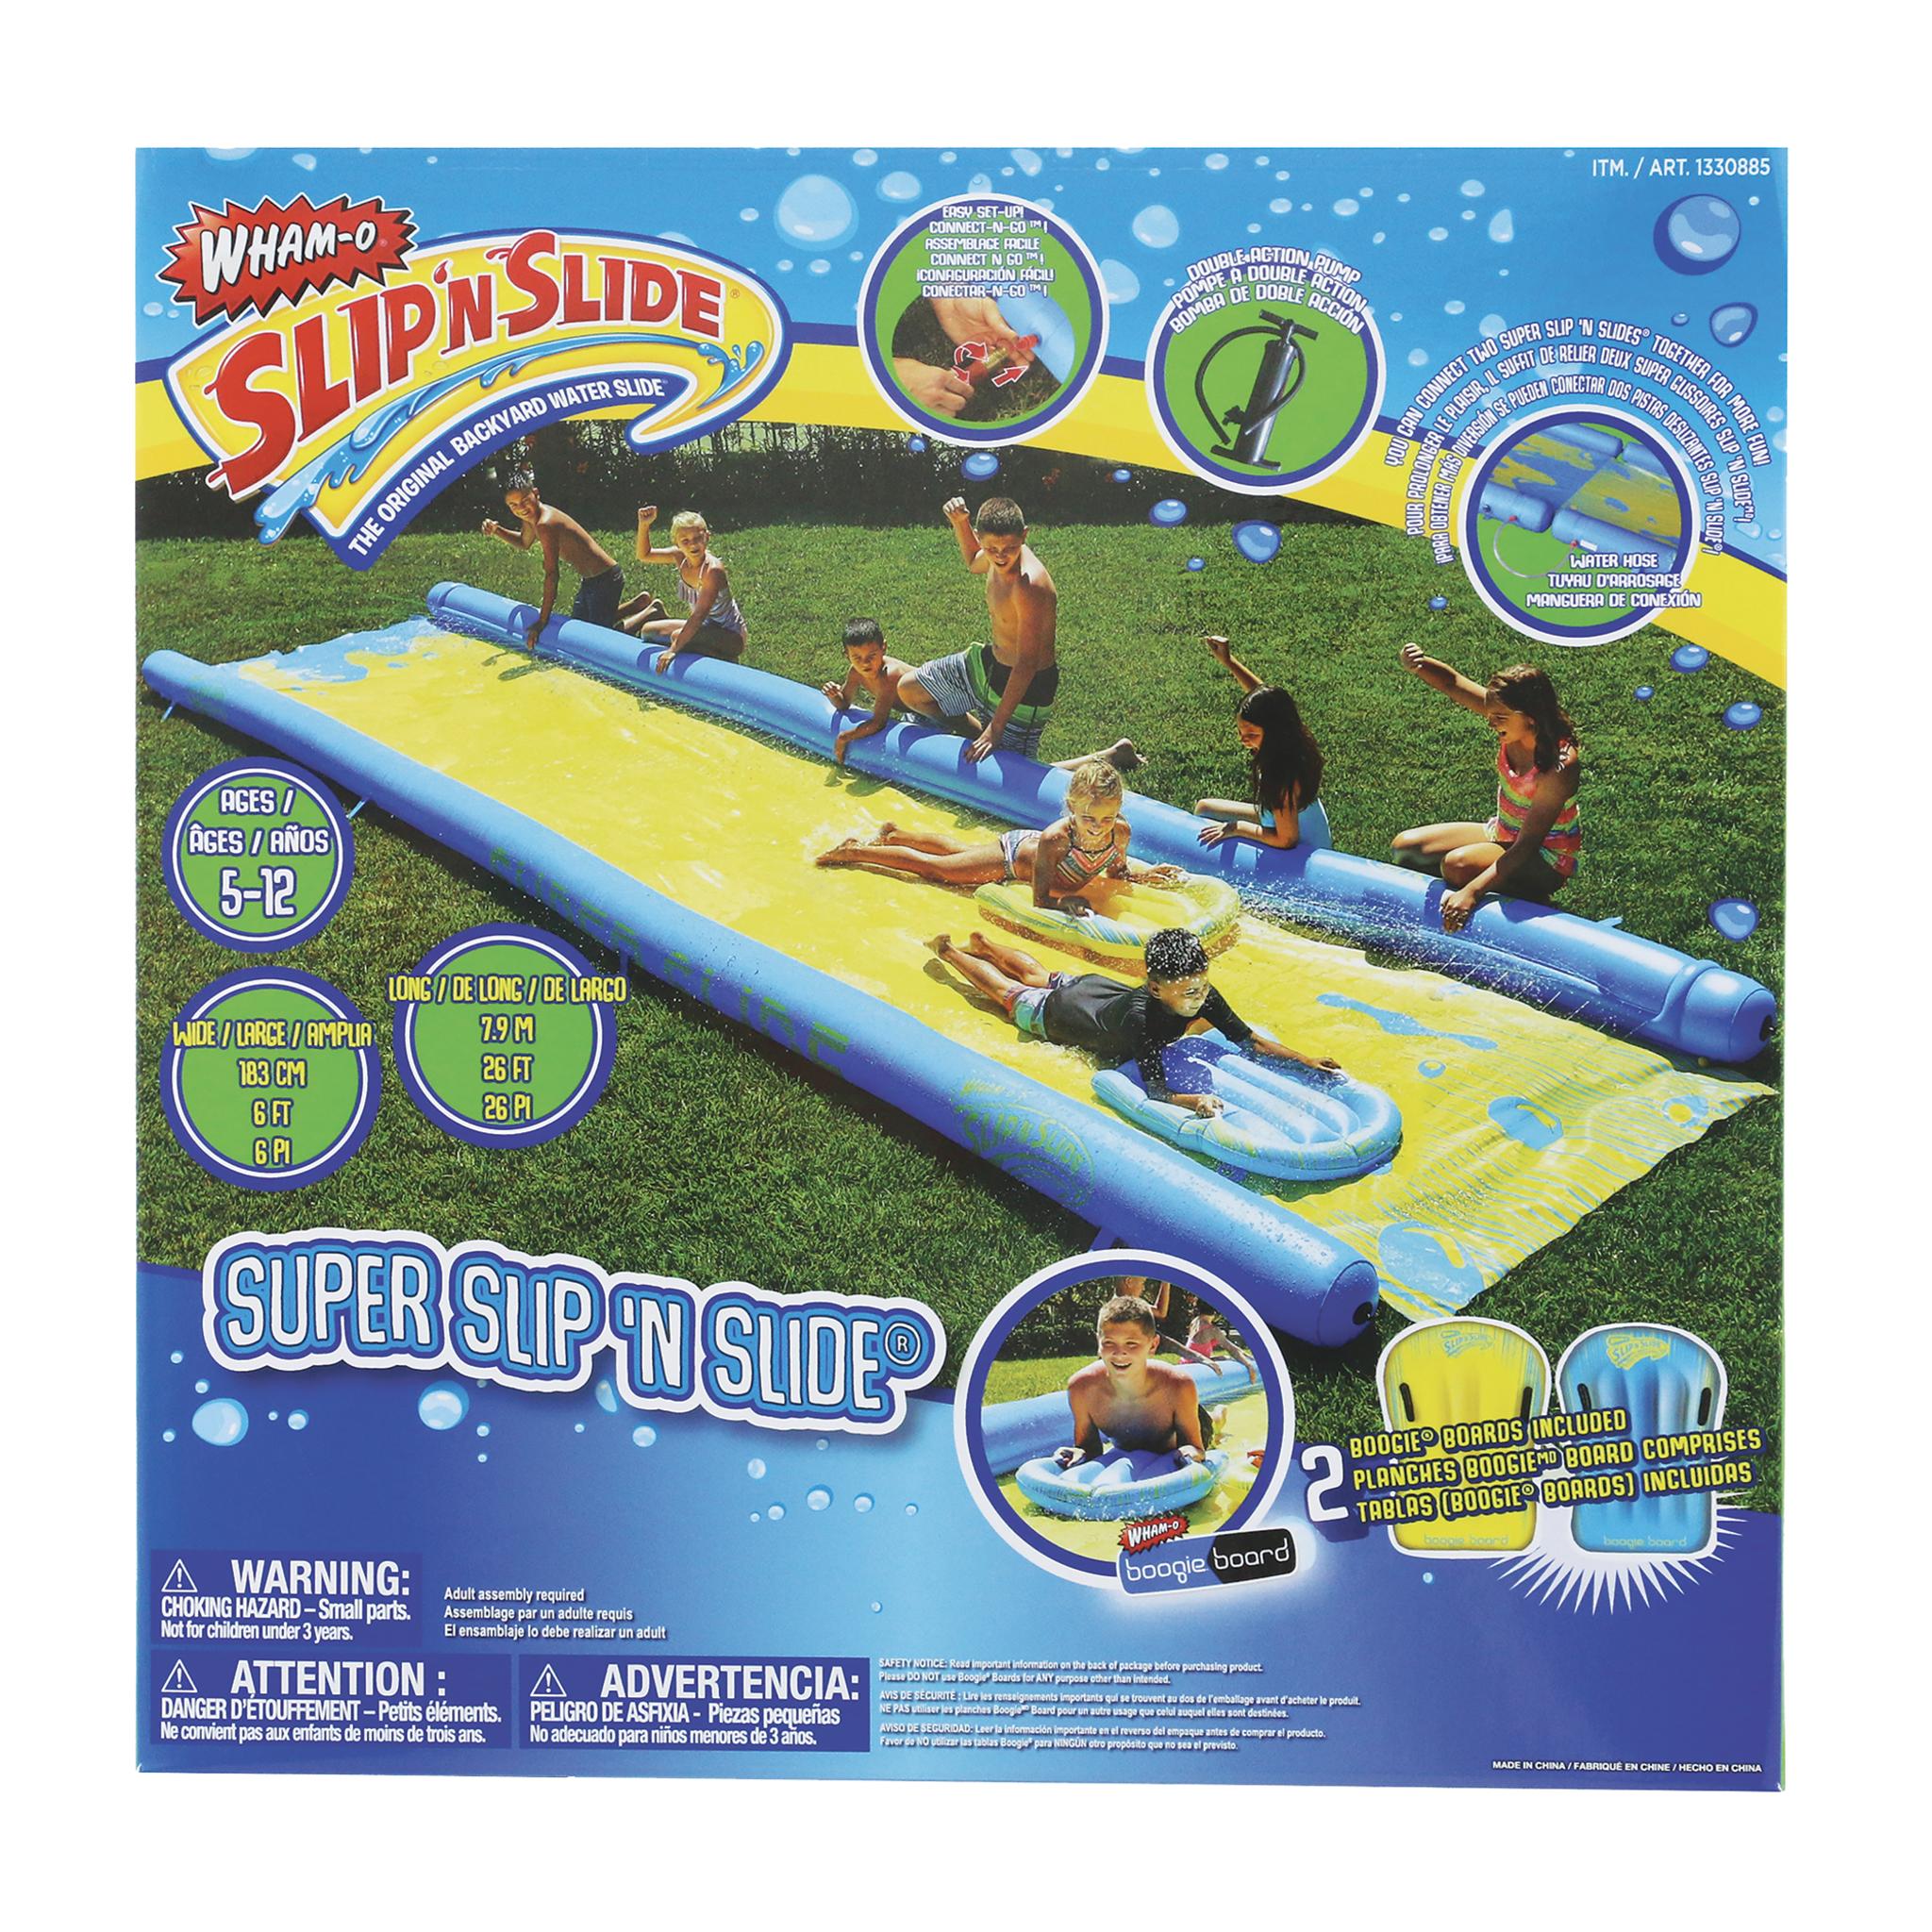 WHAM-O Slip N Slide Waterslide Super, vannbane